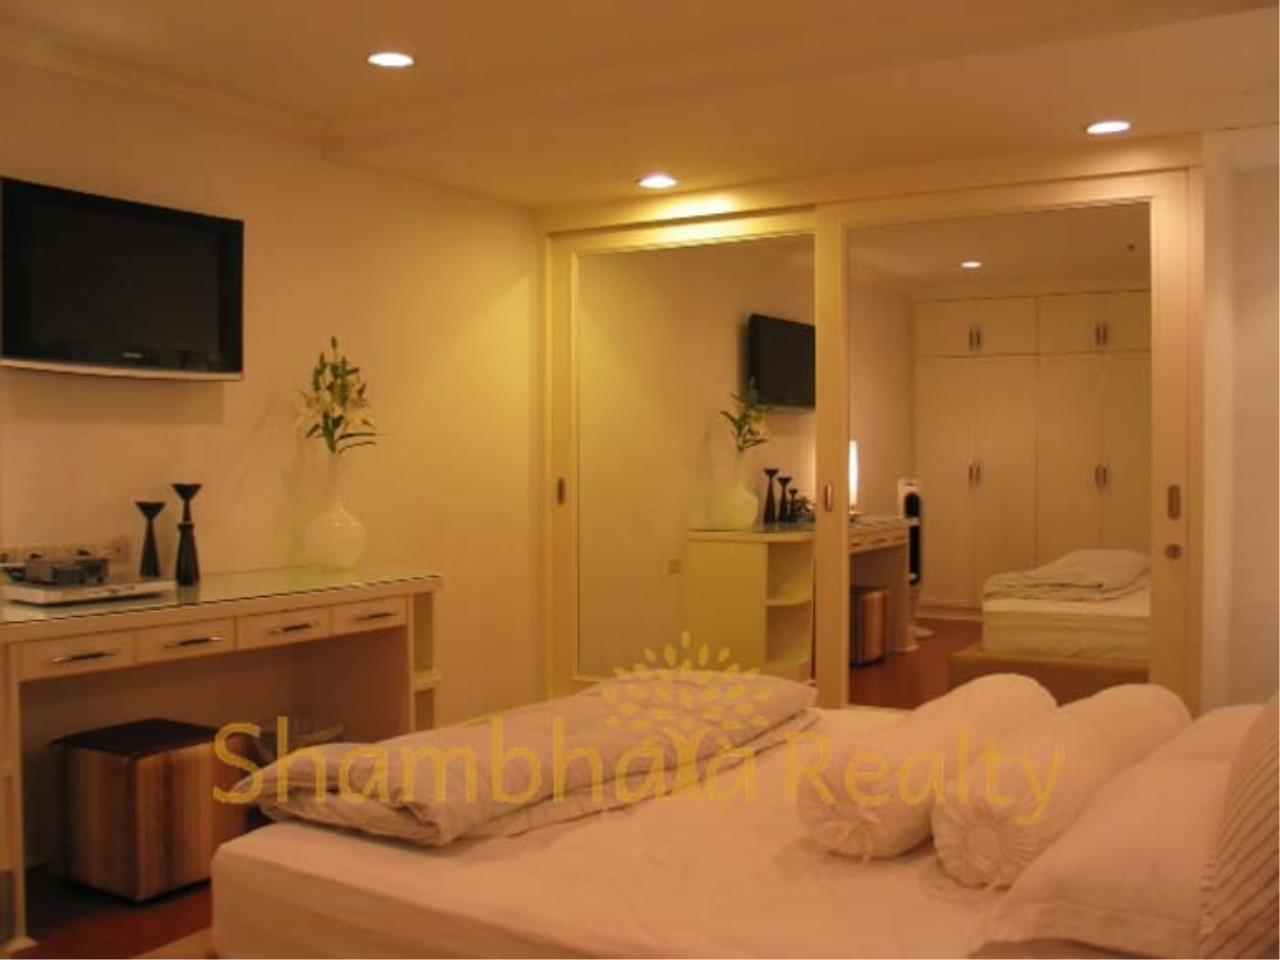 Shambhala Realty Agency's Kiat Thani Condominium for Sale in sukhumvit 31 18